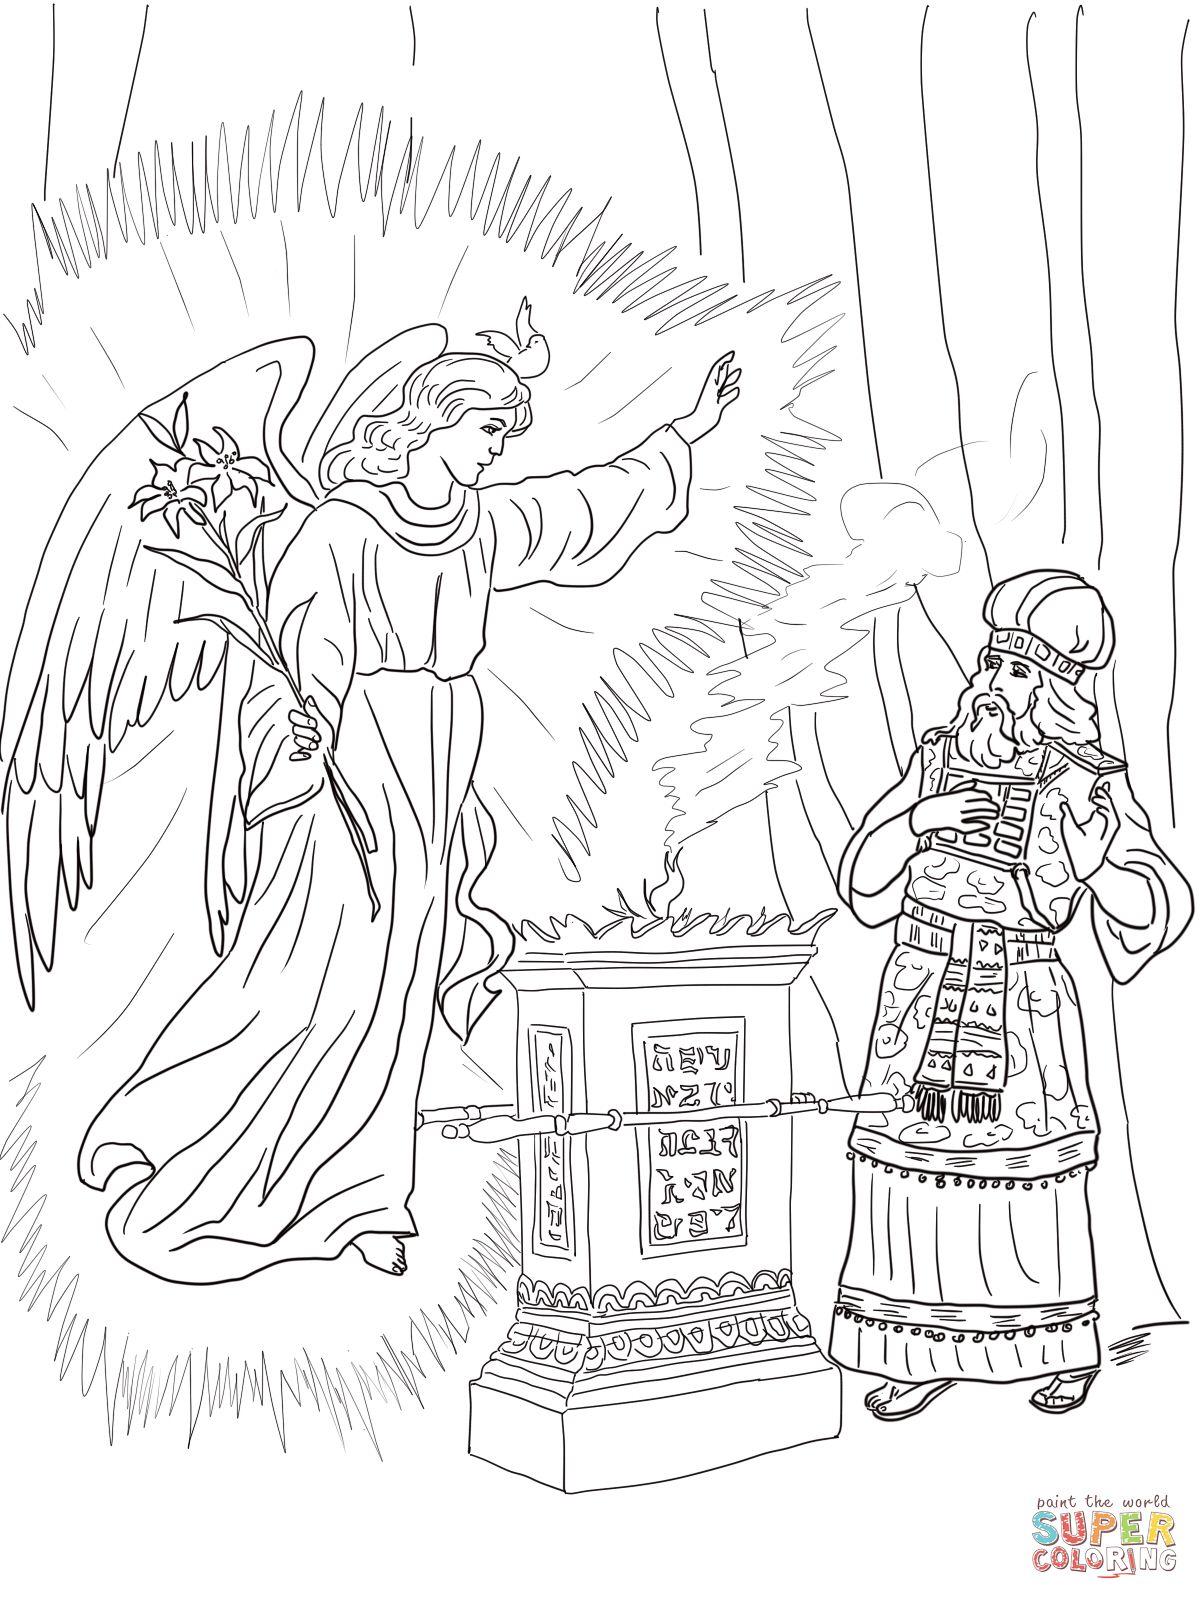 2 Angel Visits Zechariah Coloring Page 1 200 1 600